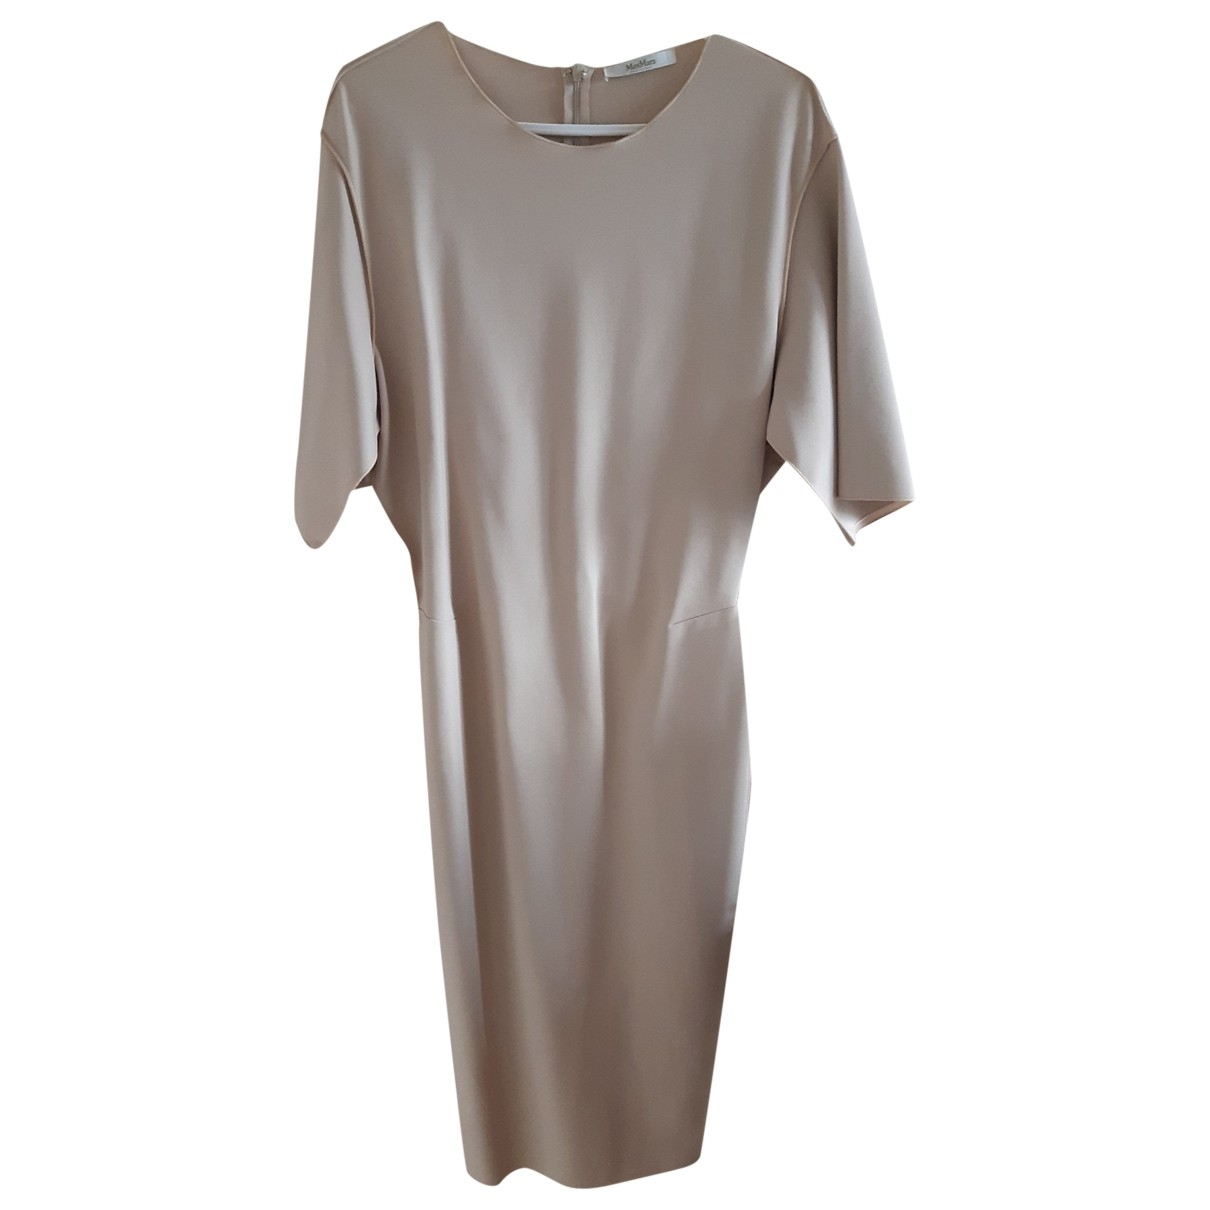 Max Mara \N Beige Cotton - elasthane dress for Women 42 IT